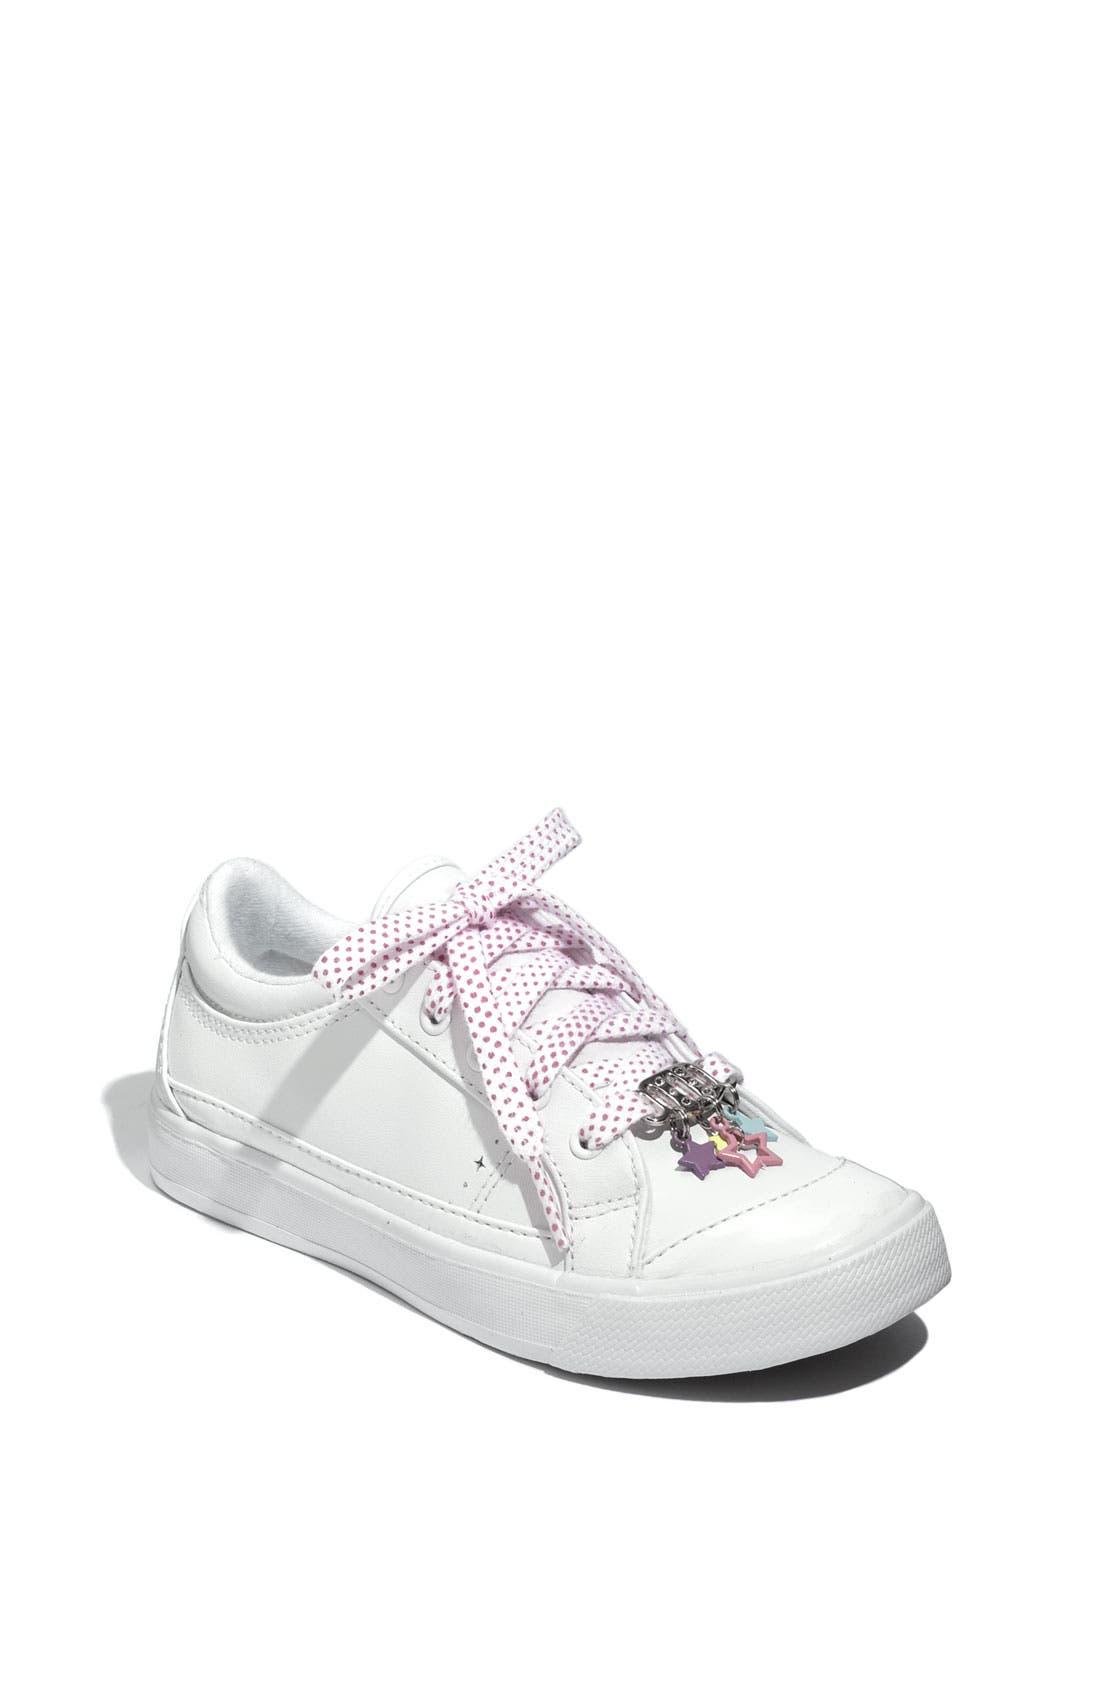 Alternate Image 1 Selected - Keds® 'Taylor' Lace Sneaker (Toddler, Little Kid & Big Kid)